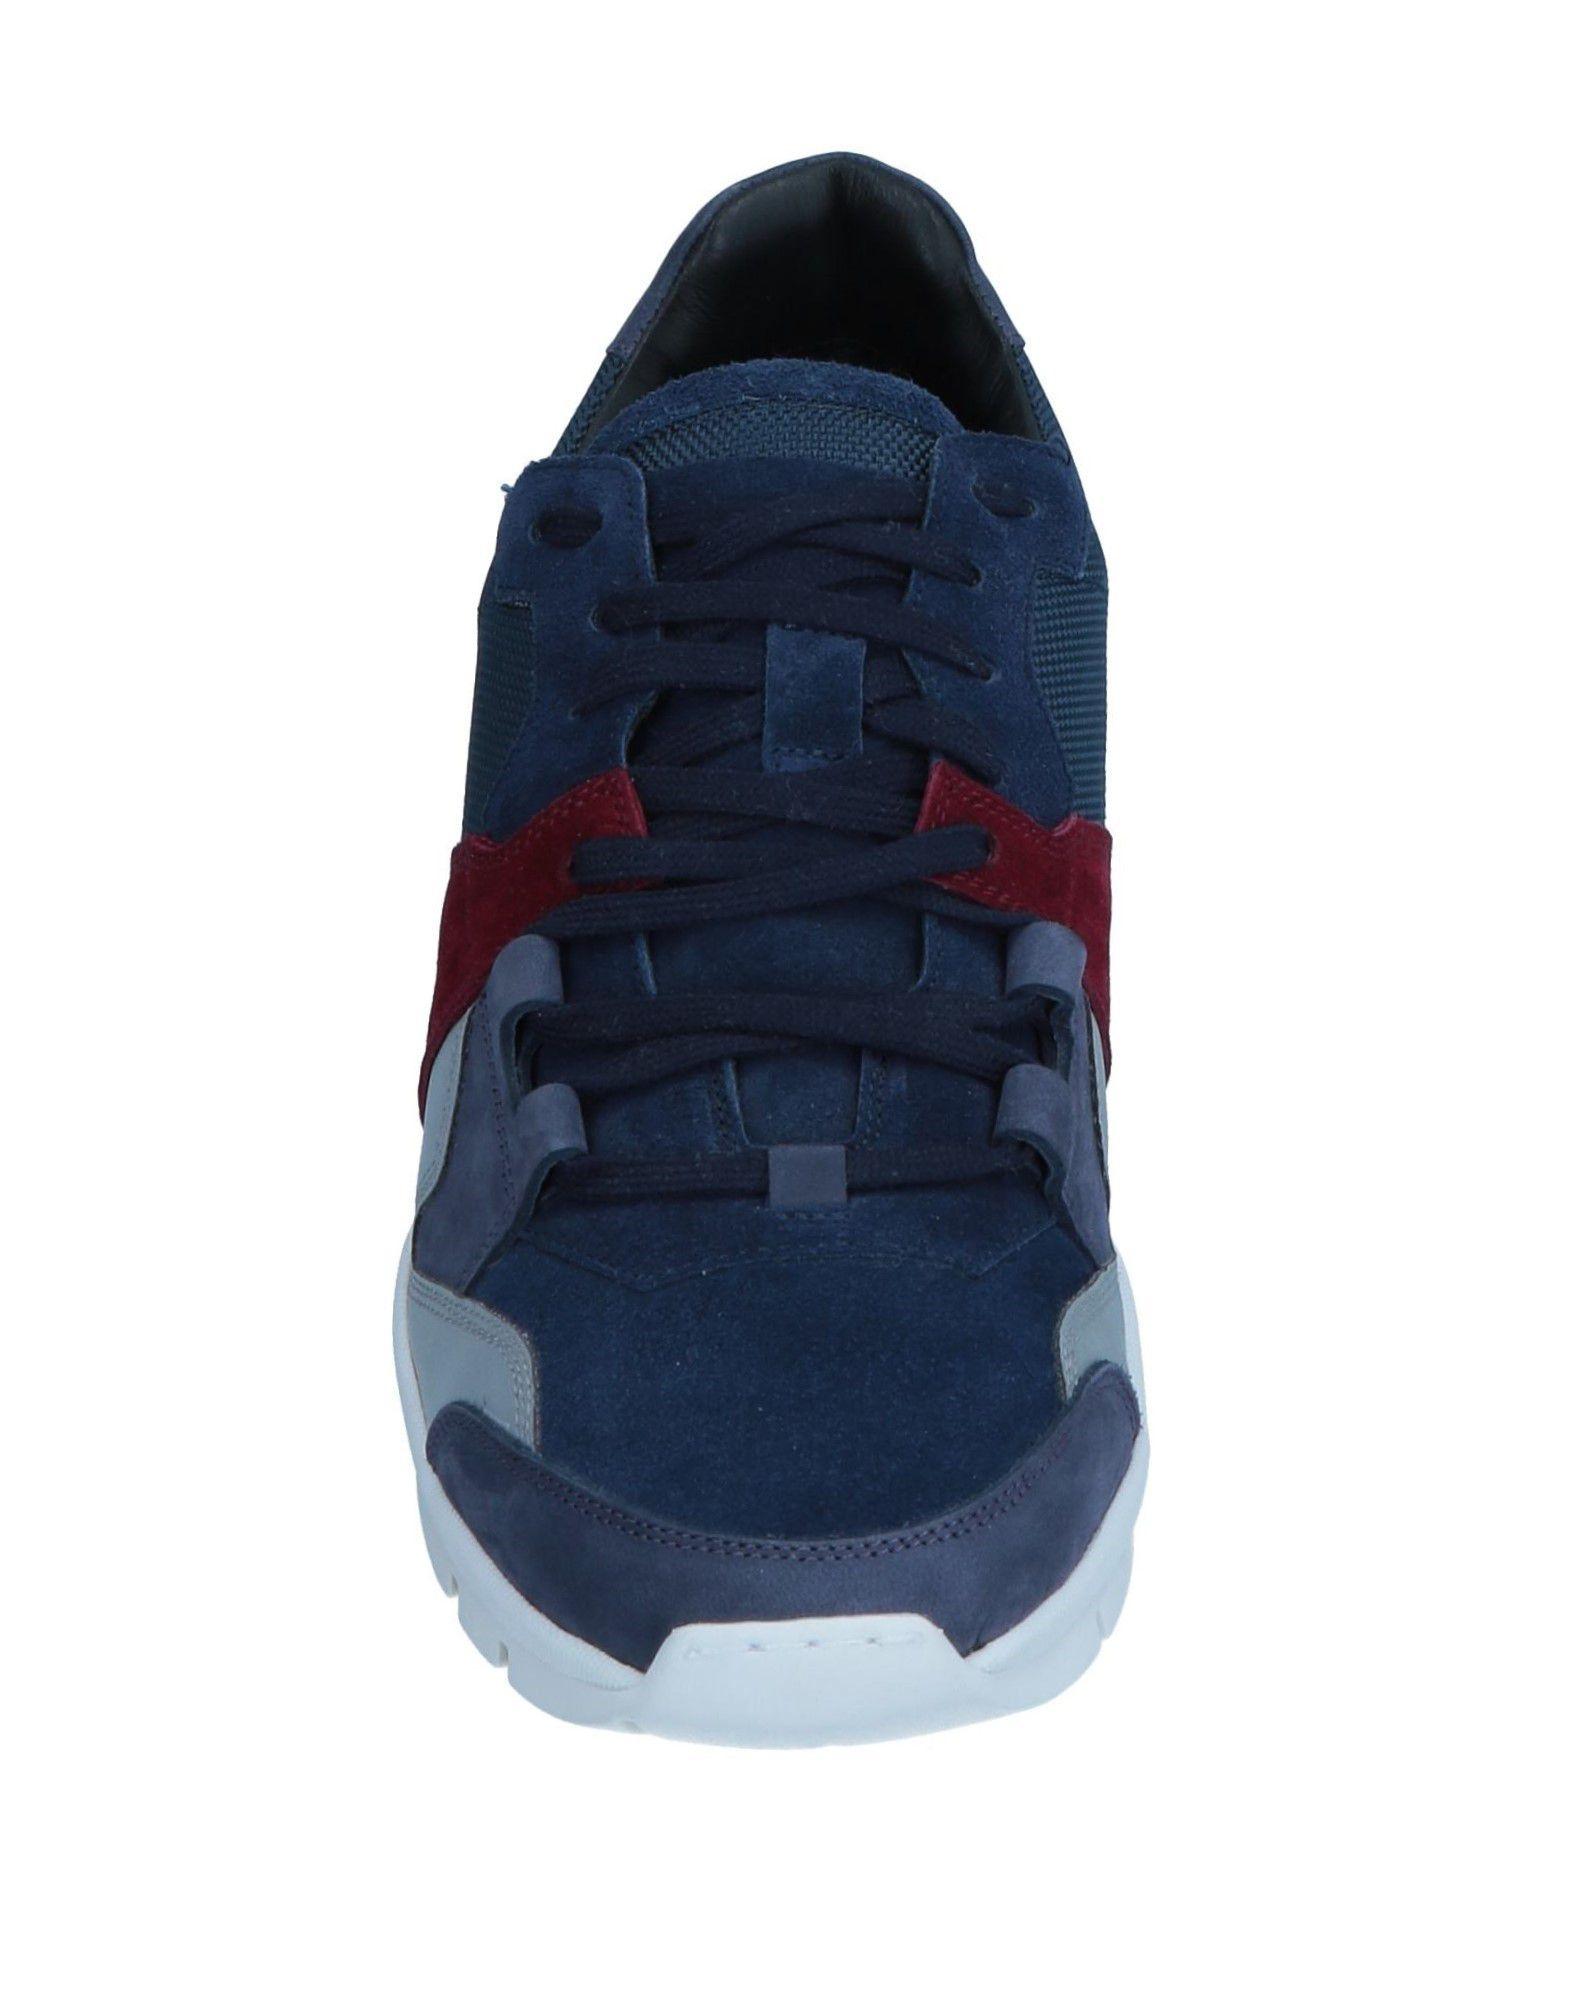 Dsquared2 Sneakers Herren Qualität  11555865HG Gute Qualität Herren beliebte Schuhe e7e25c